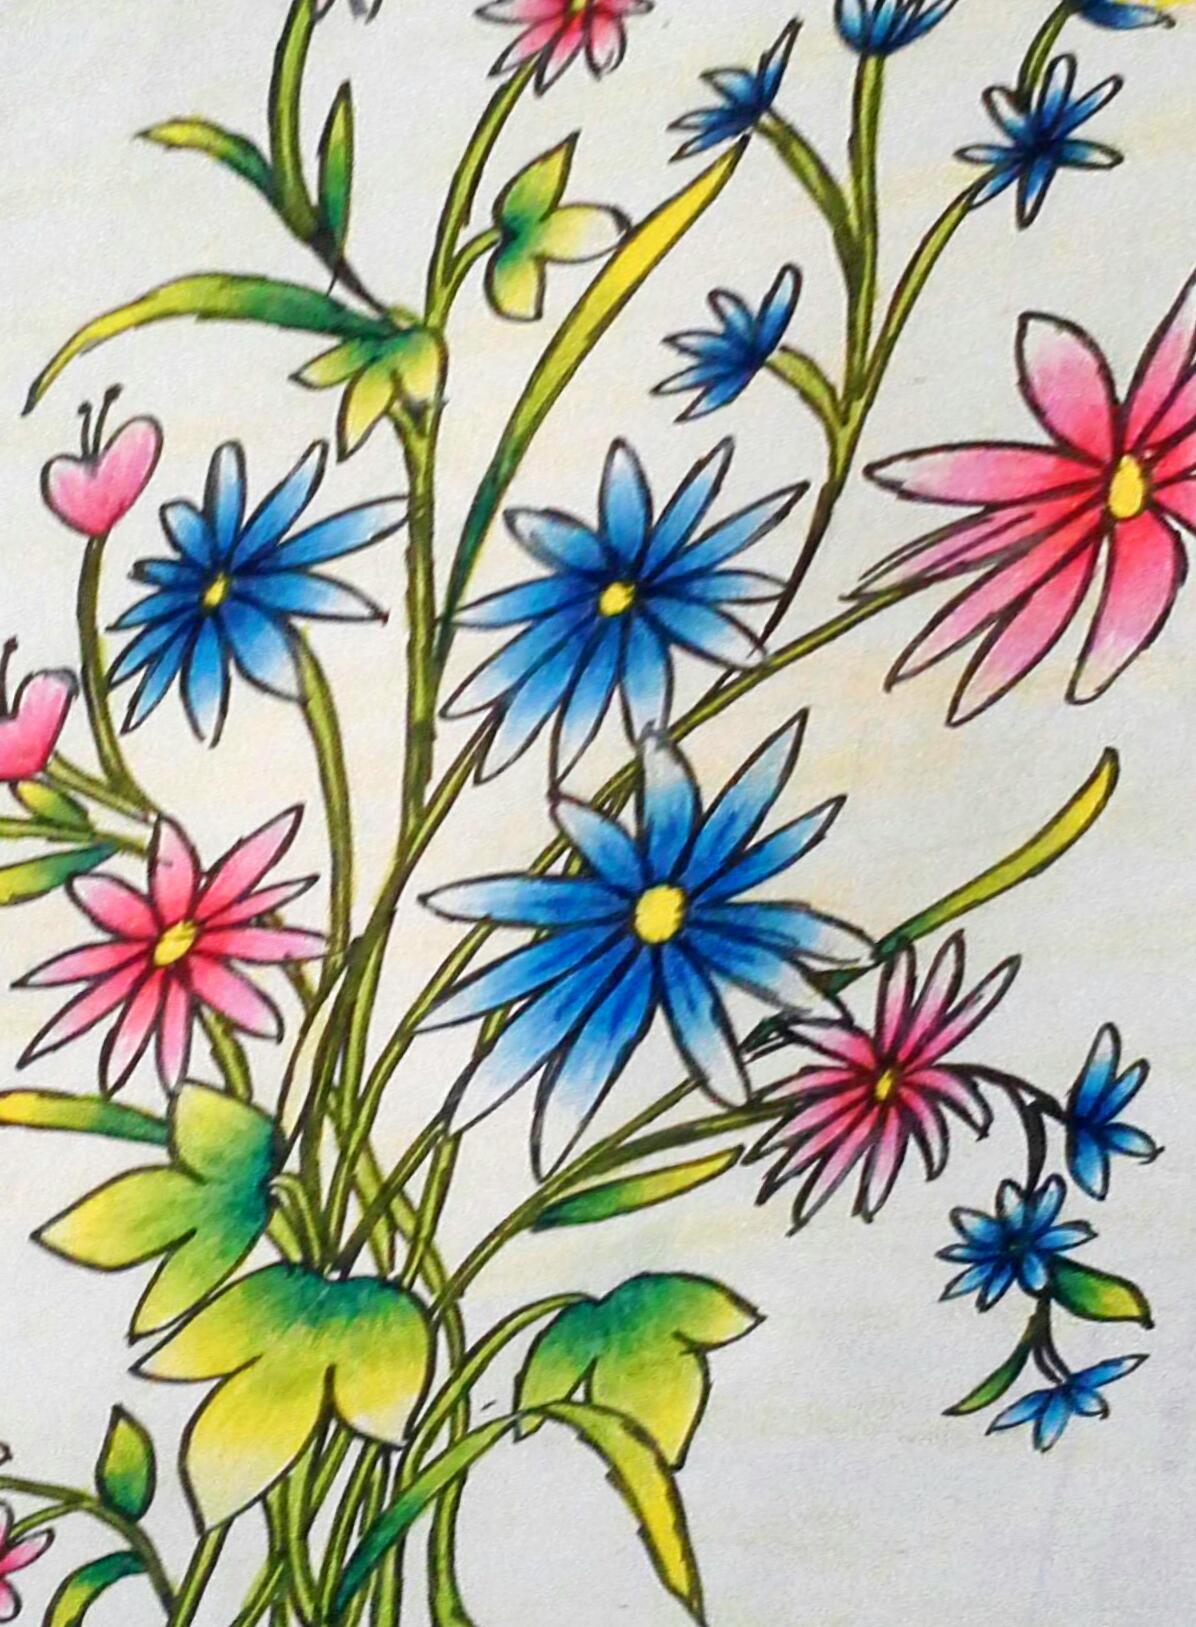 Ragam Hias Tumbuhan : ragam, tumbuhan, RAGAM, BAKTI